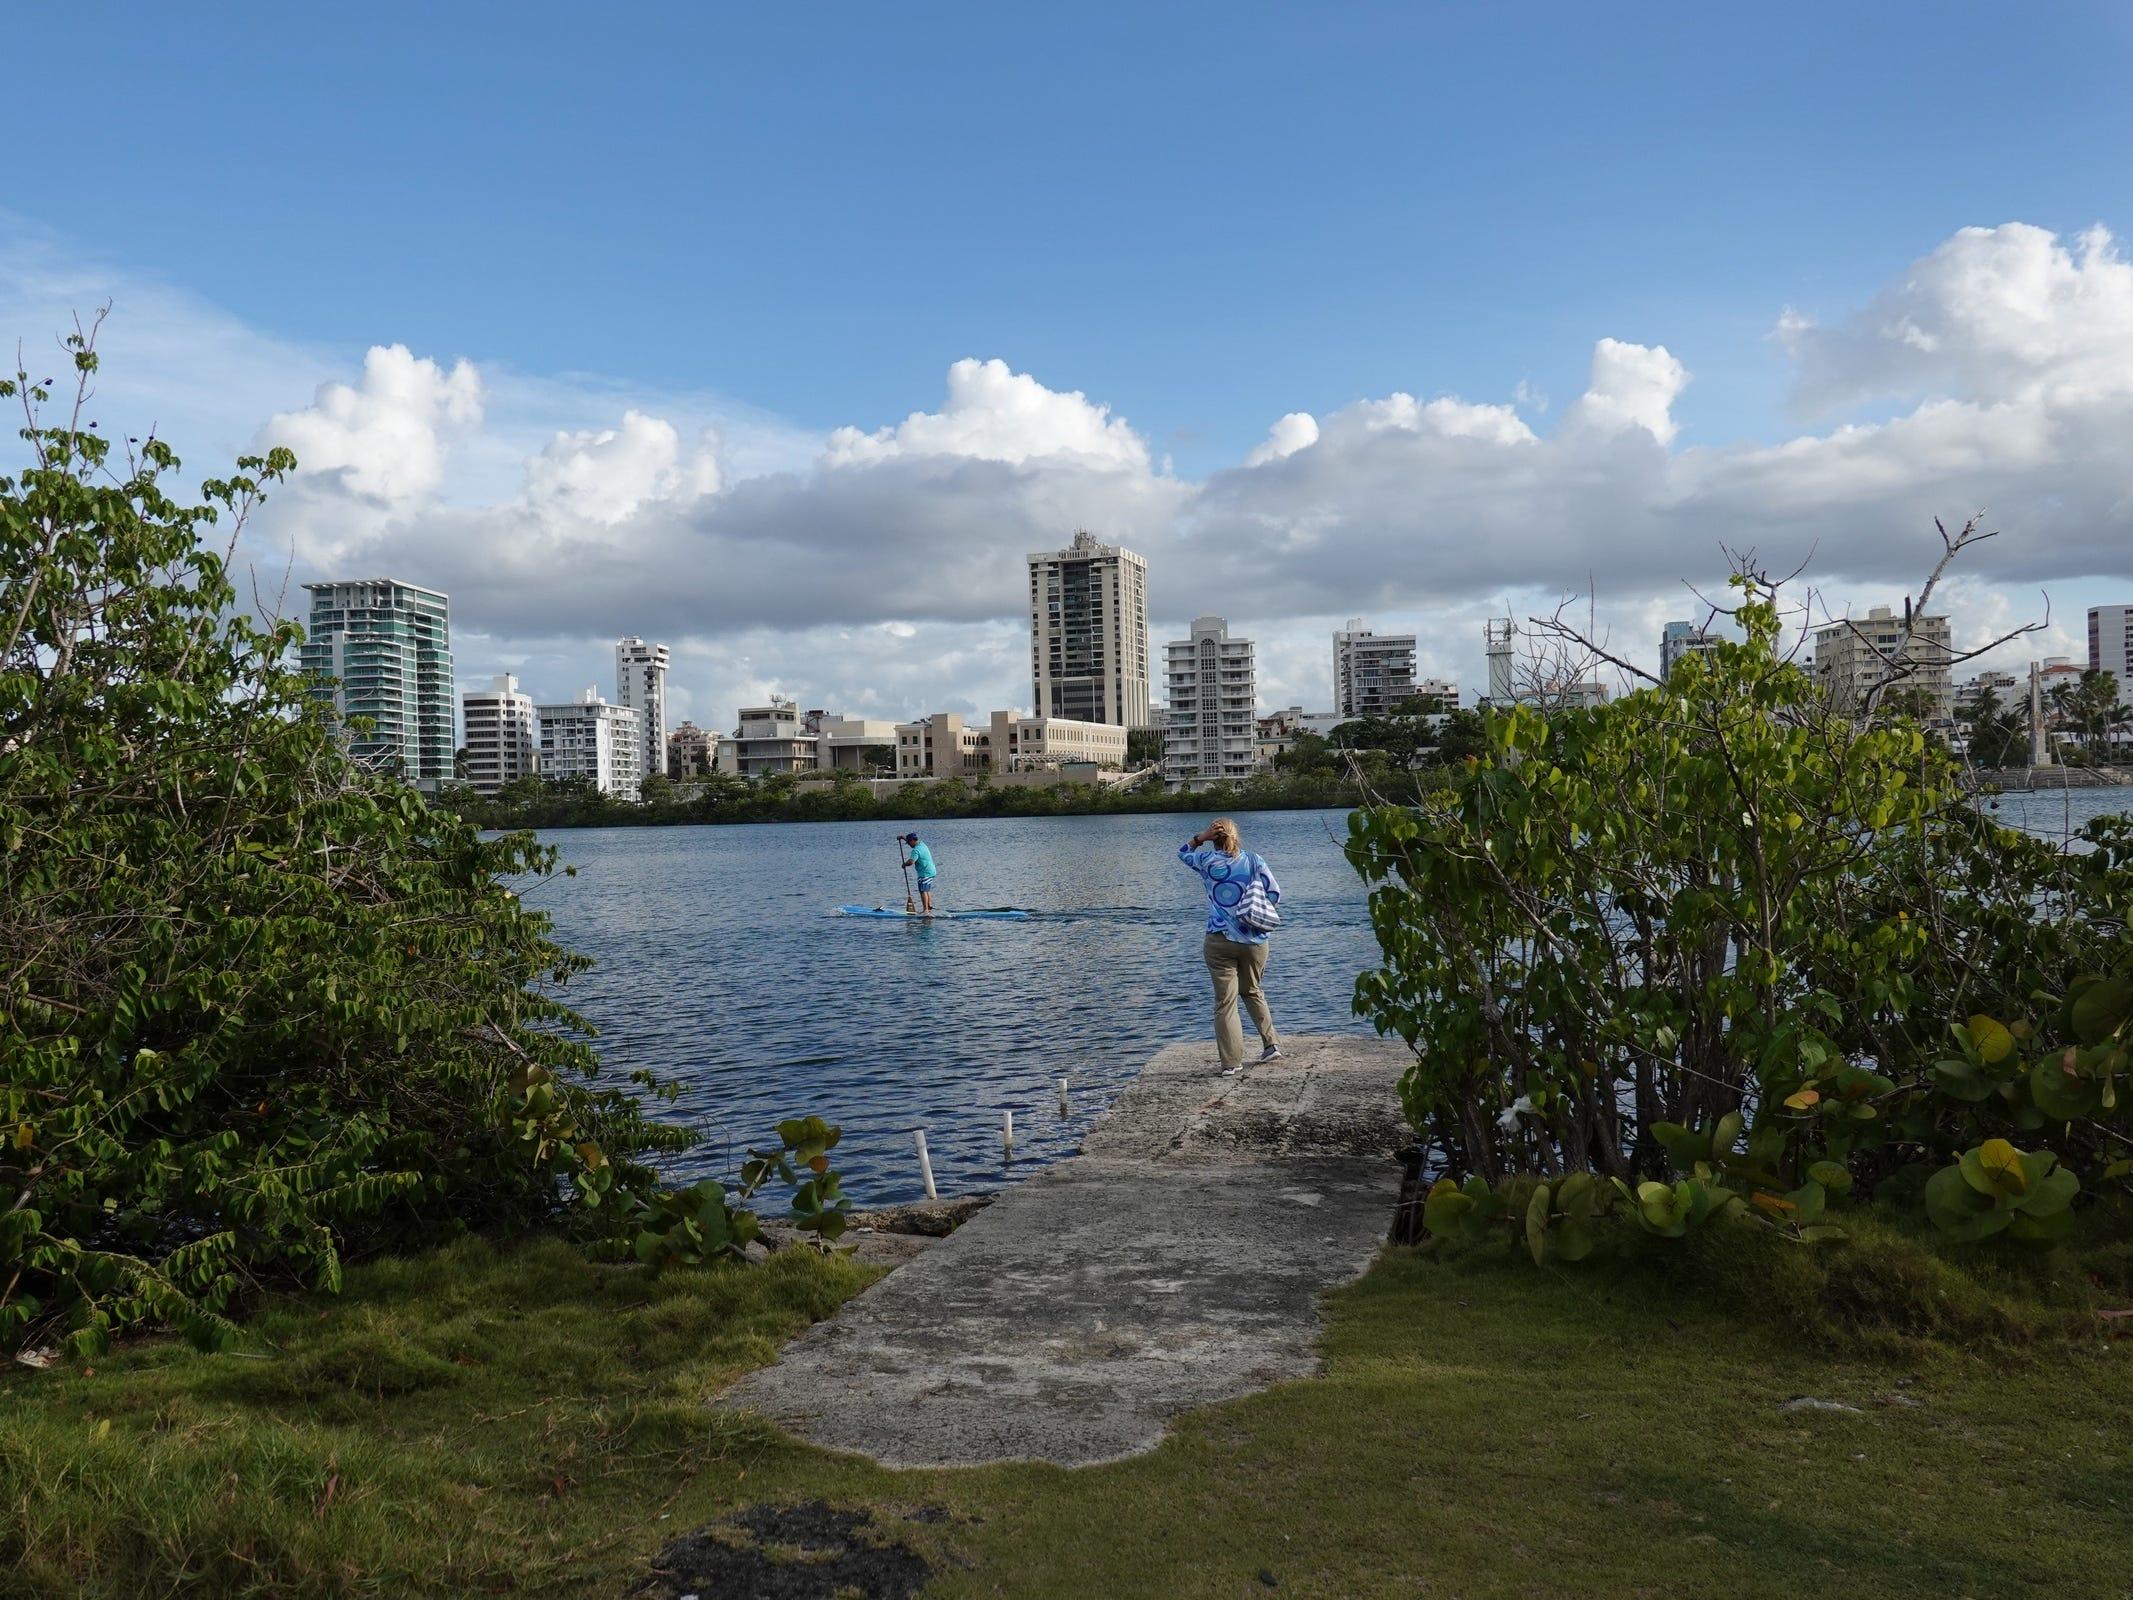 A paddle boarder passes by on Laguna del Condado in San Juan, Puerto Rico.